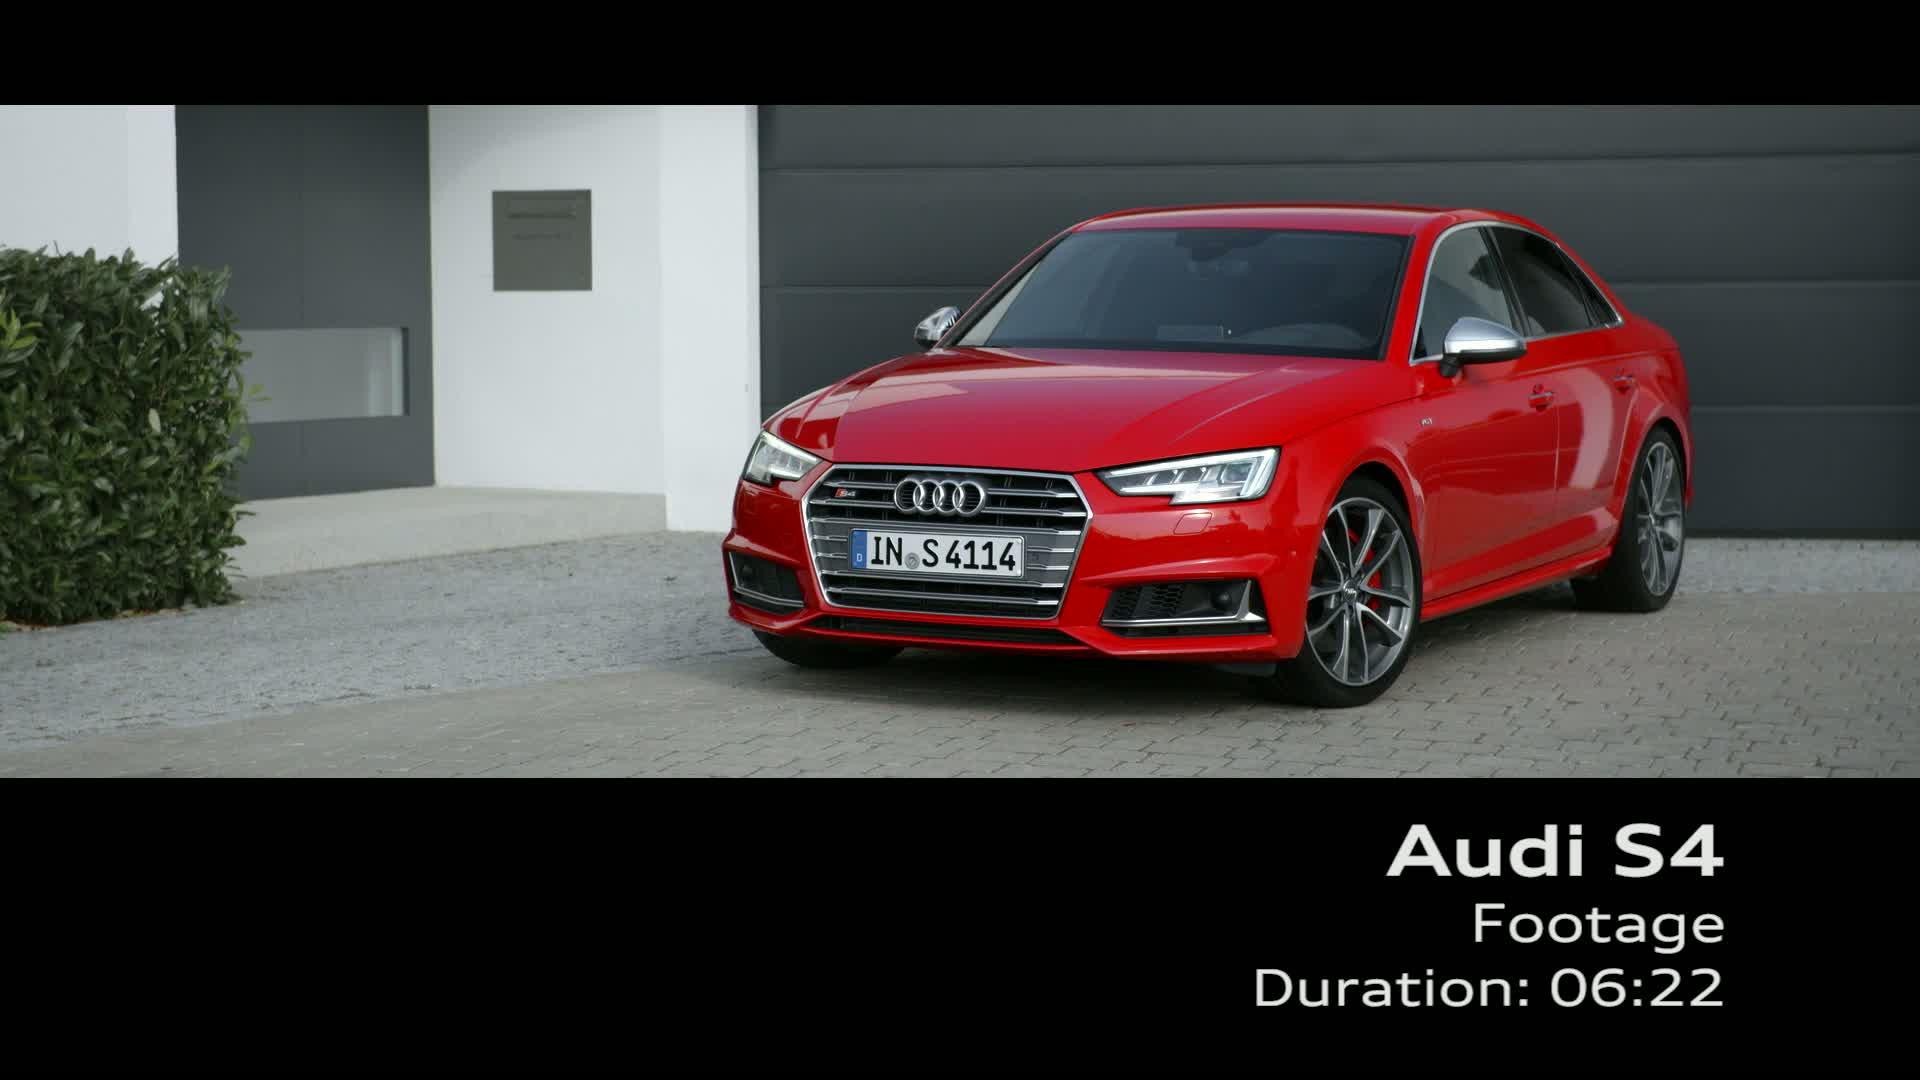 Audi S4 - Footage